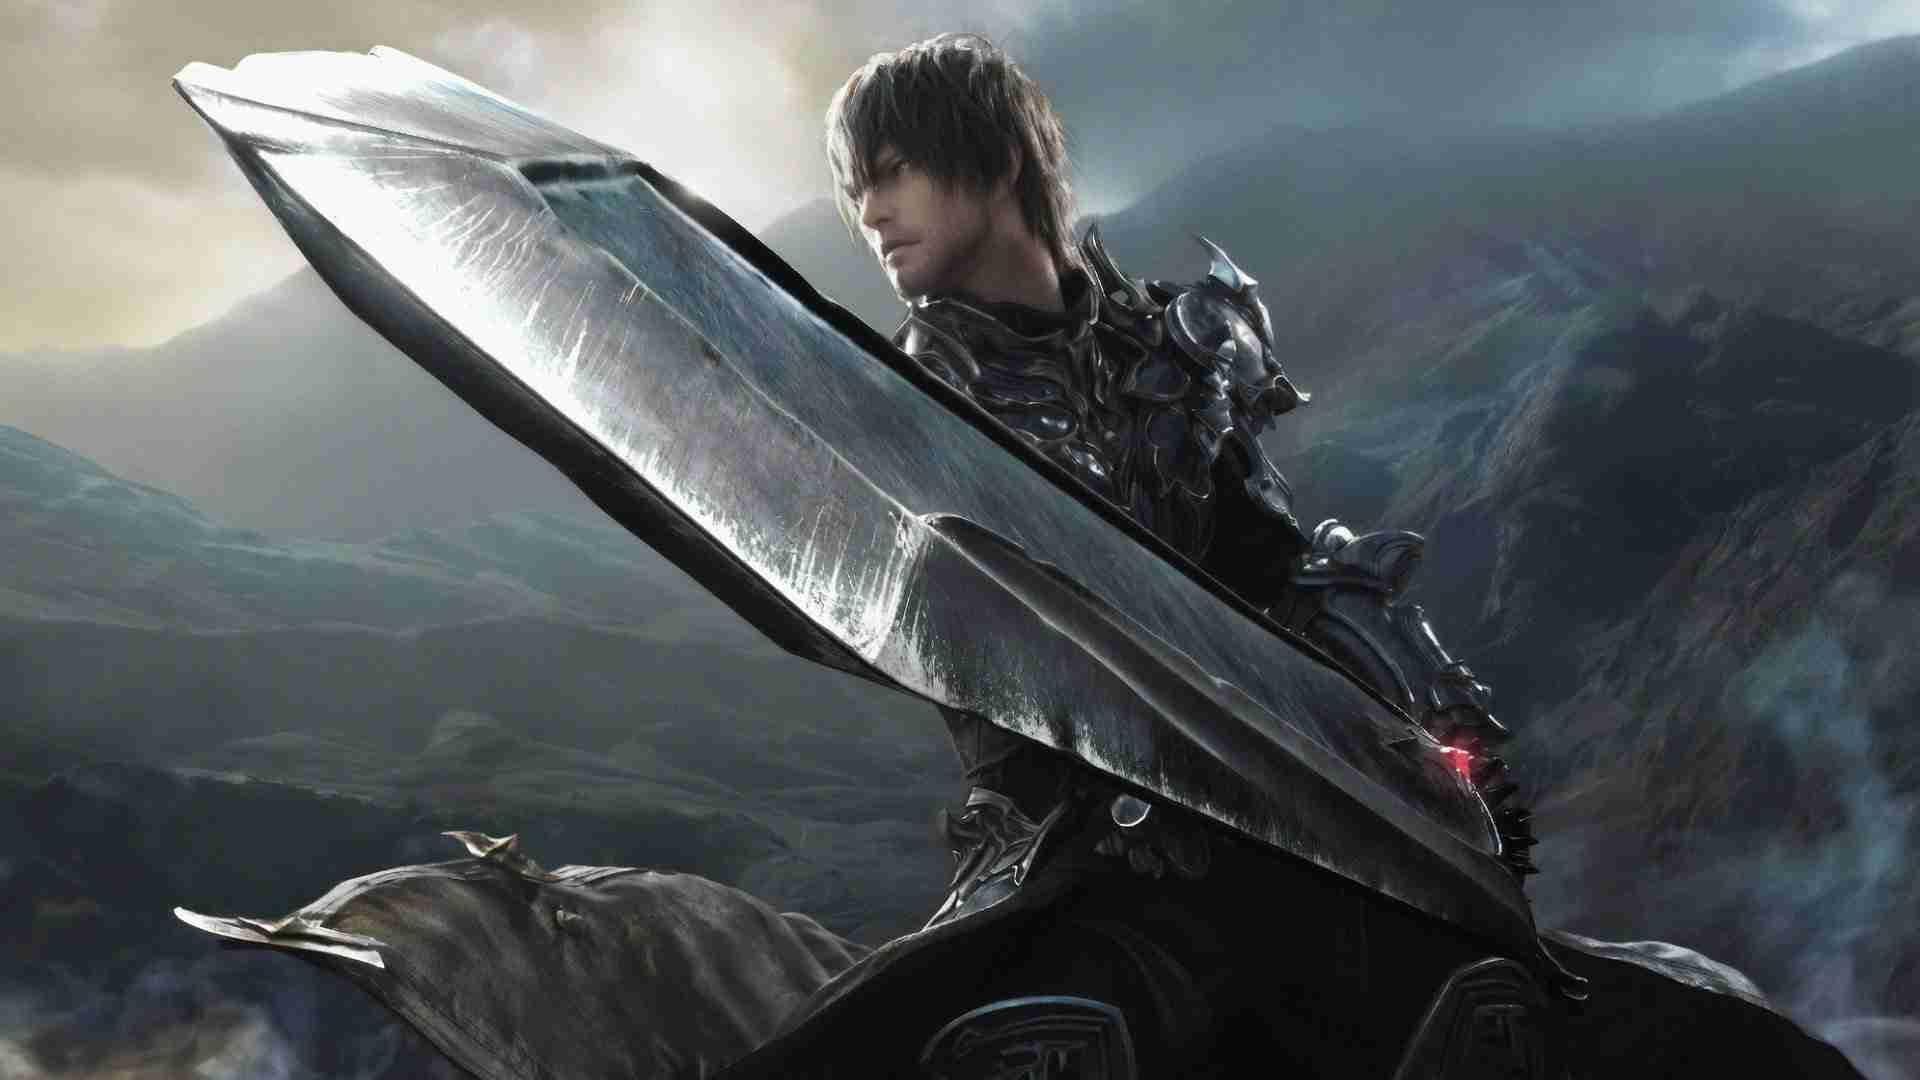 Final Fantasy XIV Online 5.5